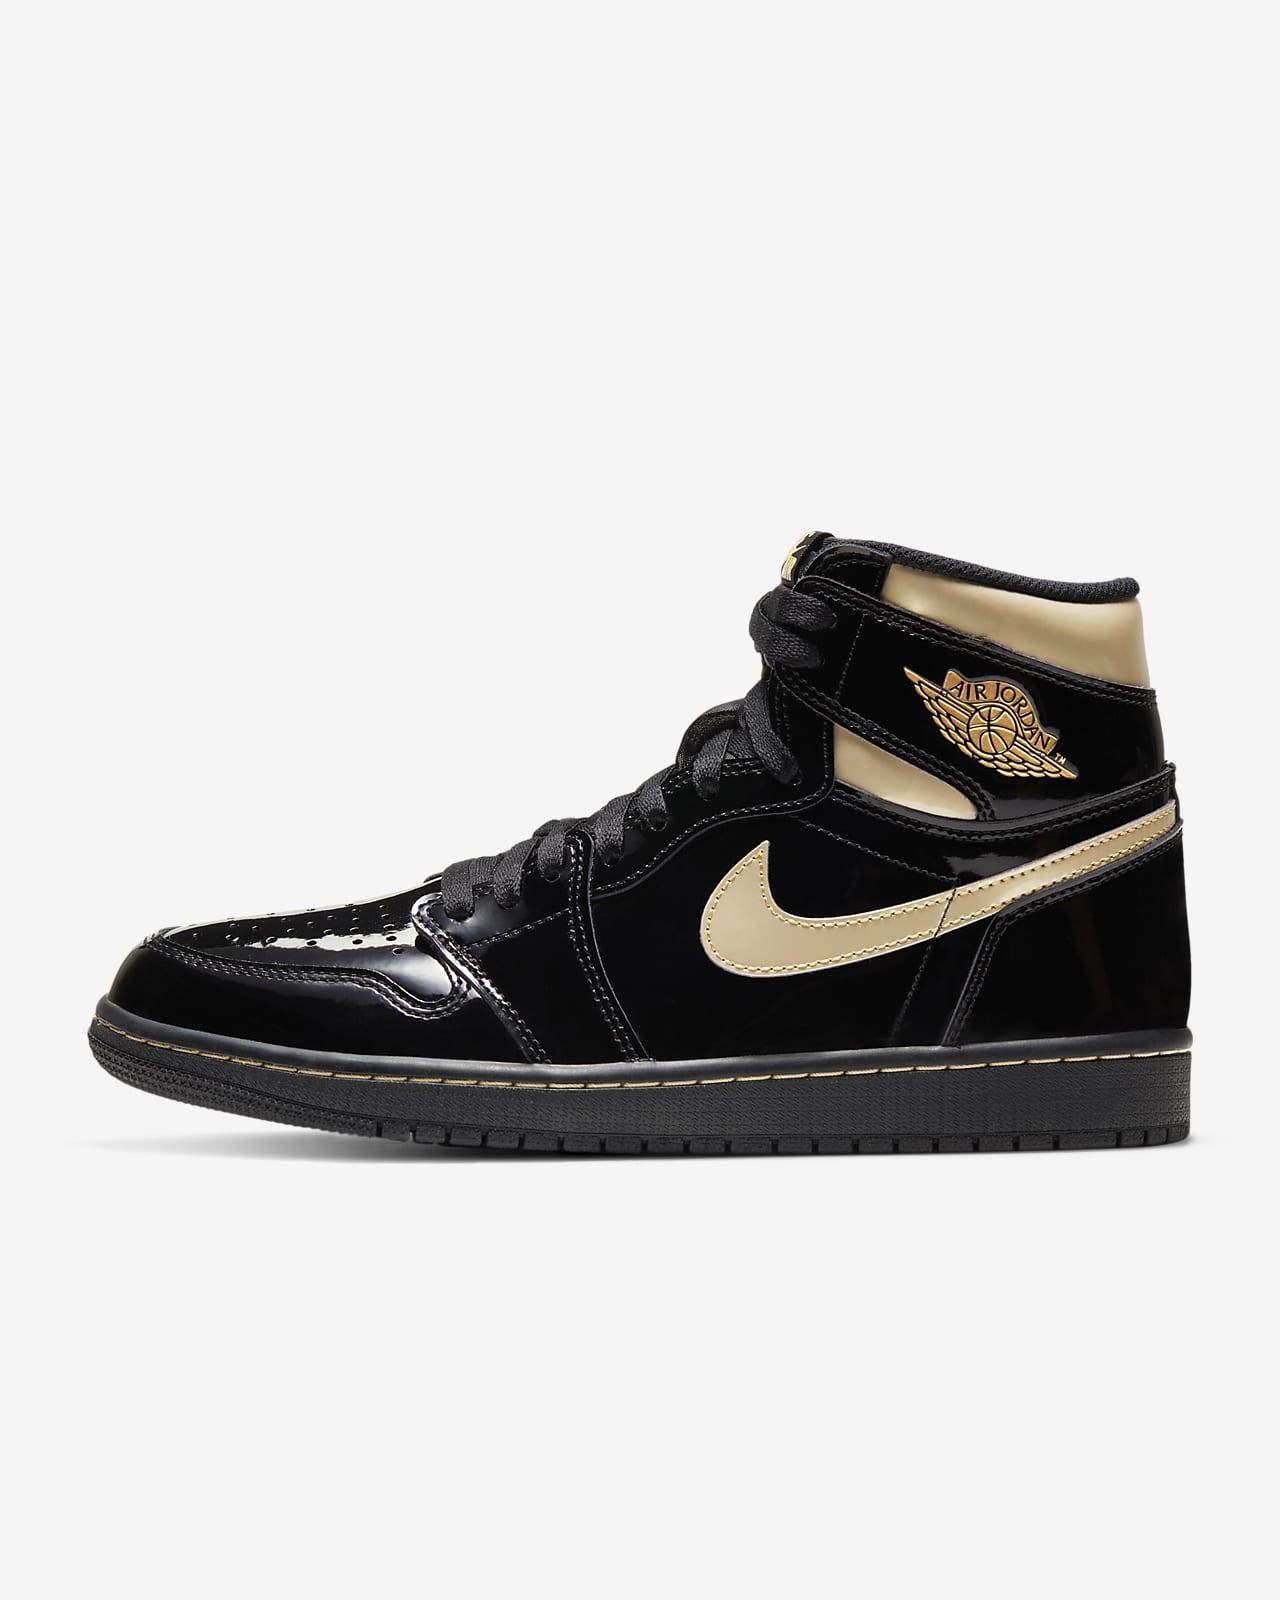 Air Jordan 1 Retro High OG Shoe